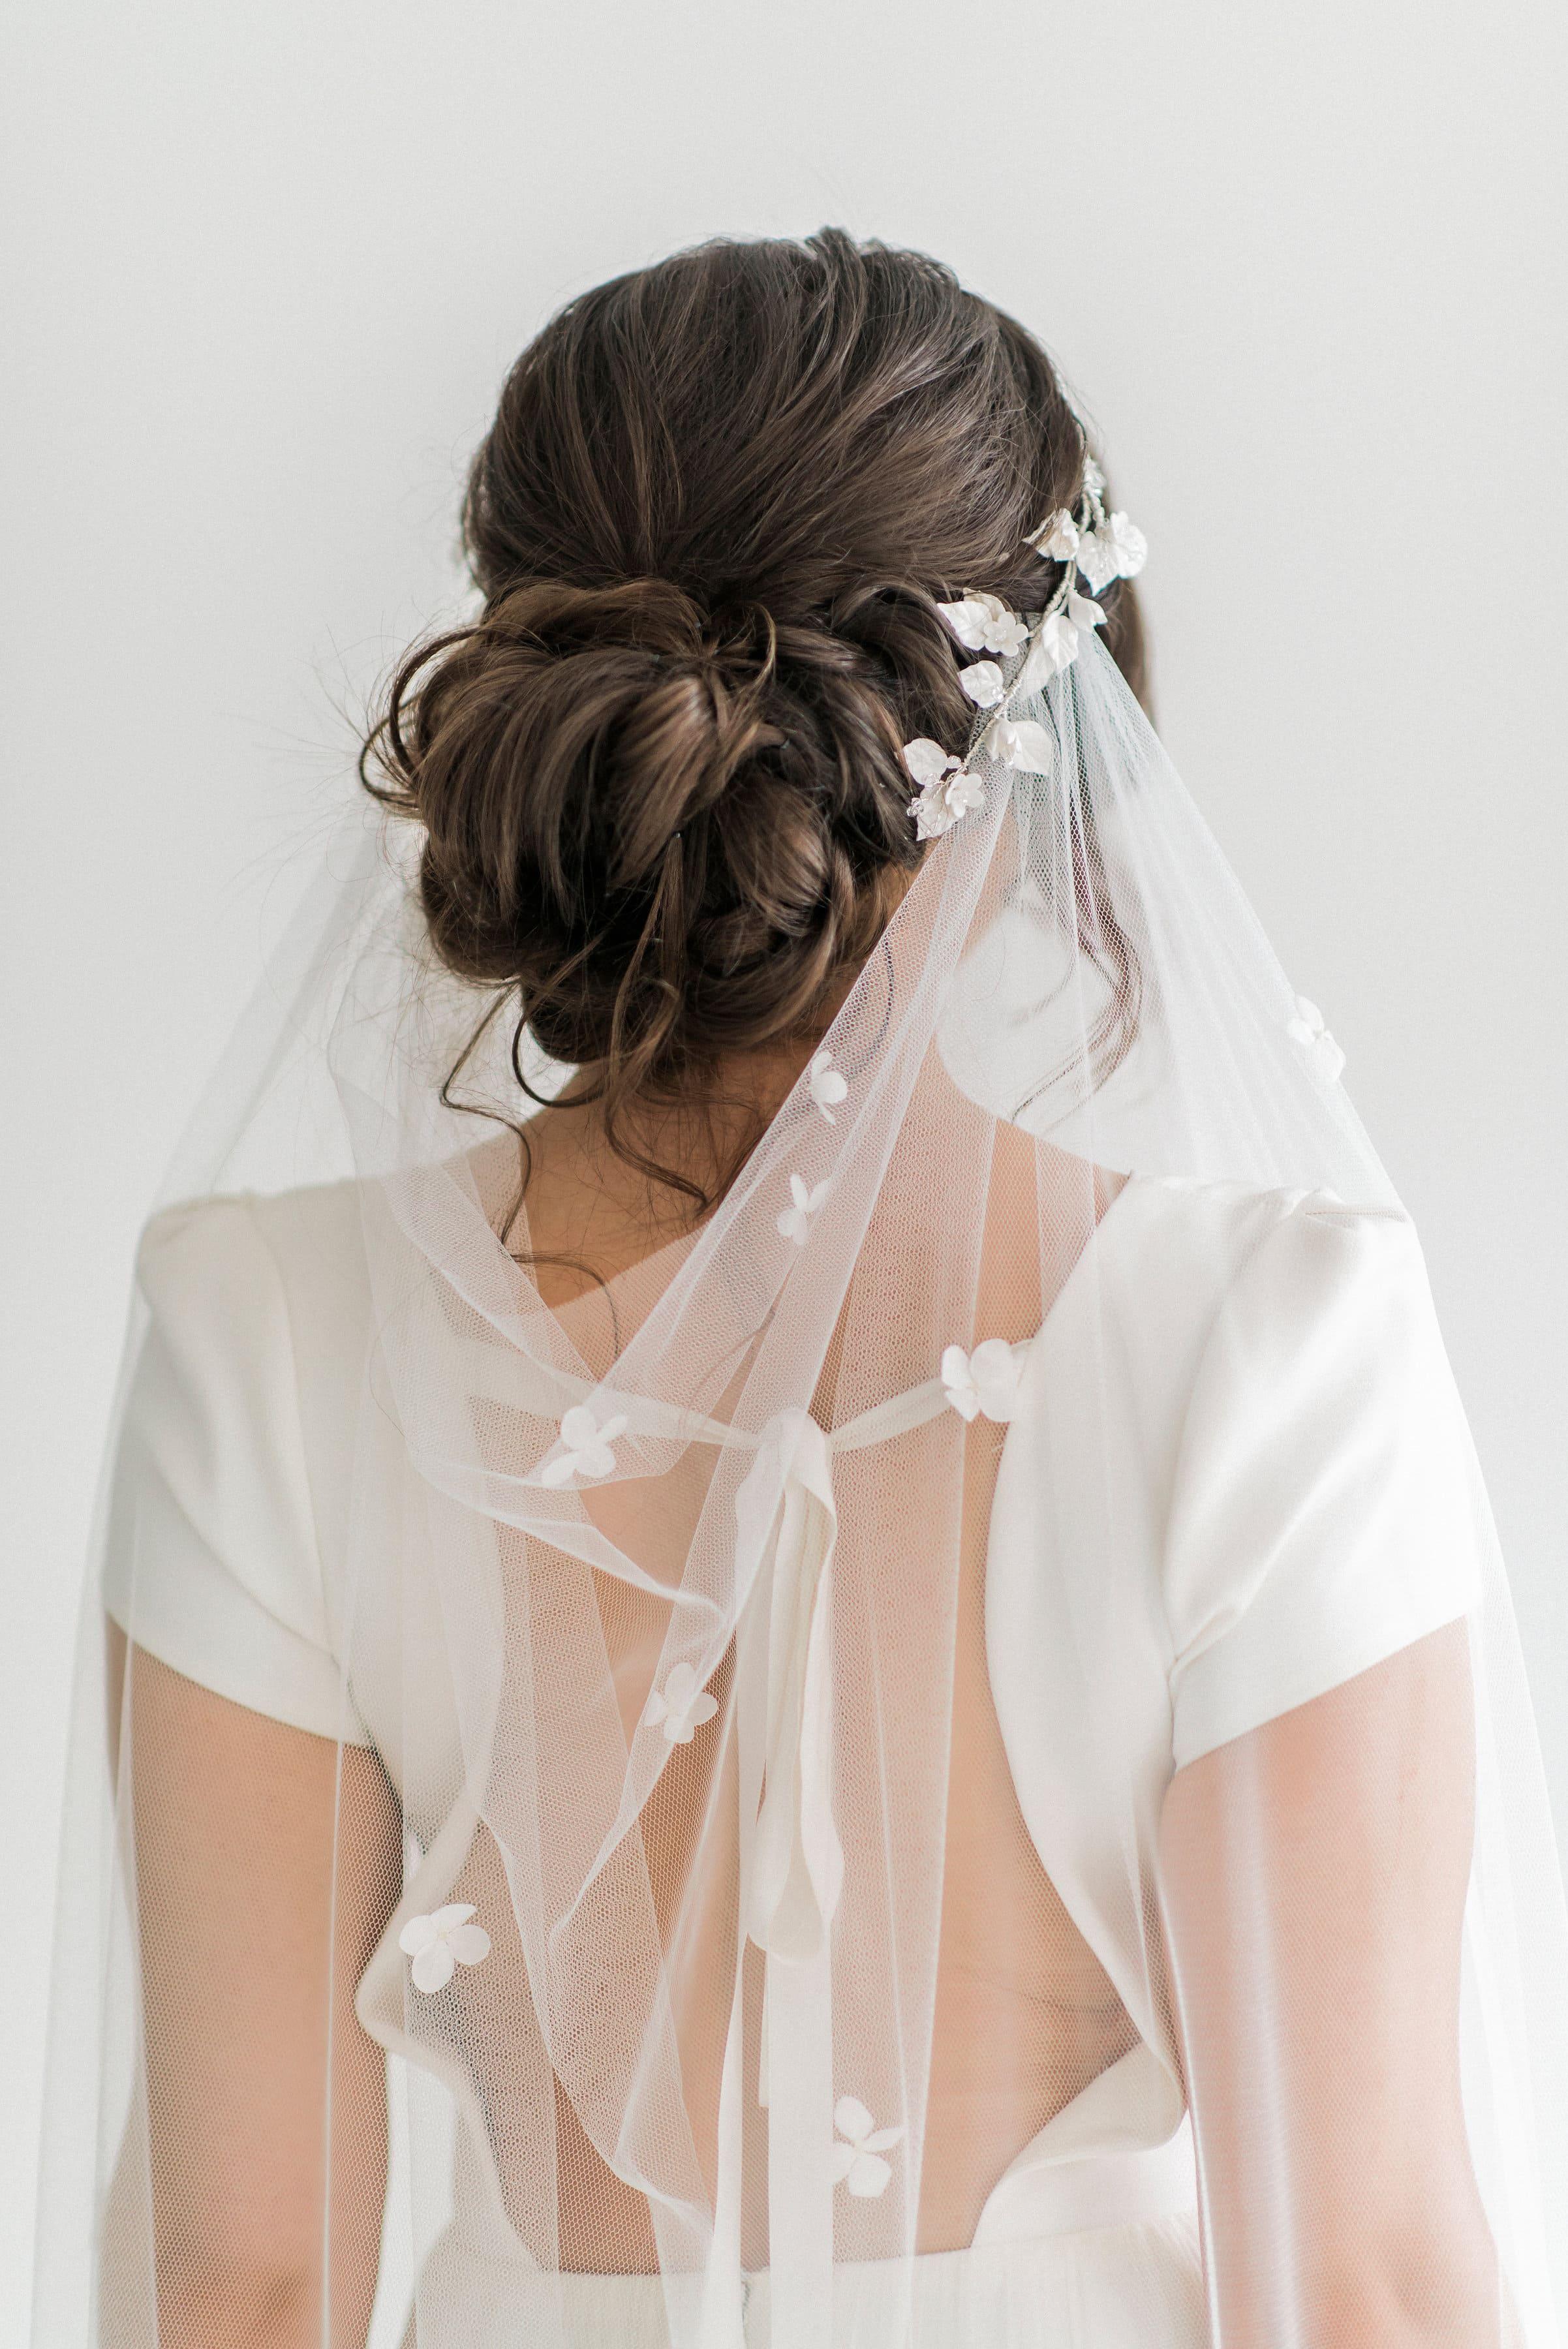 Julietta Draped Petal Wedding Veil Sash And Veil Artisan Veil Maker